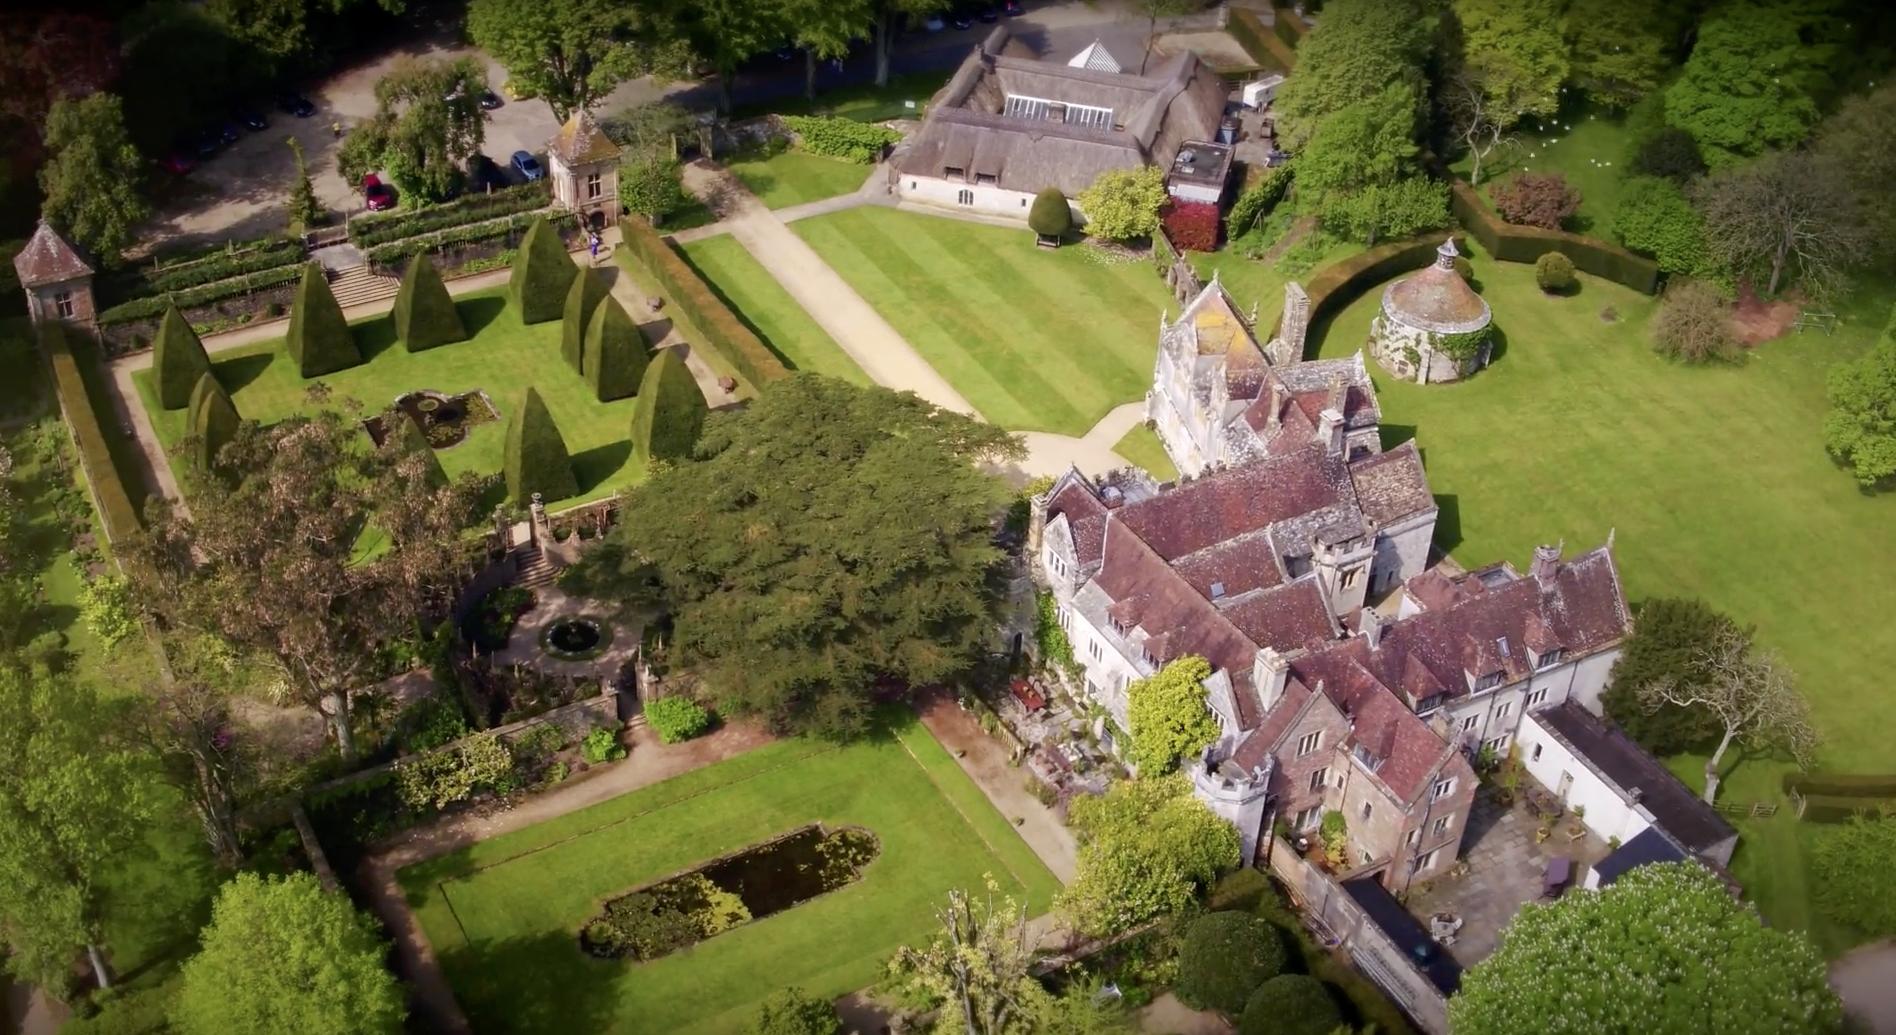 Explore Dorset's Gardens